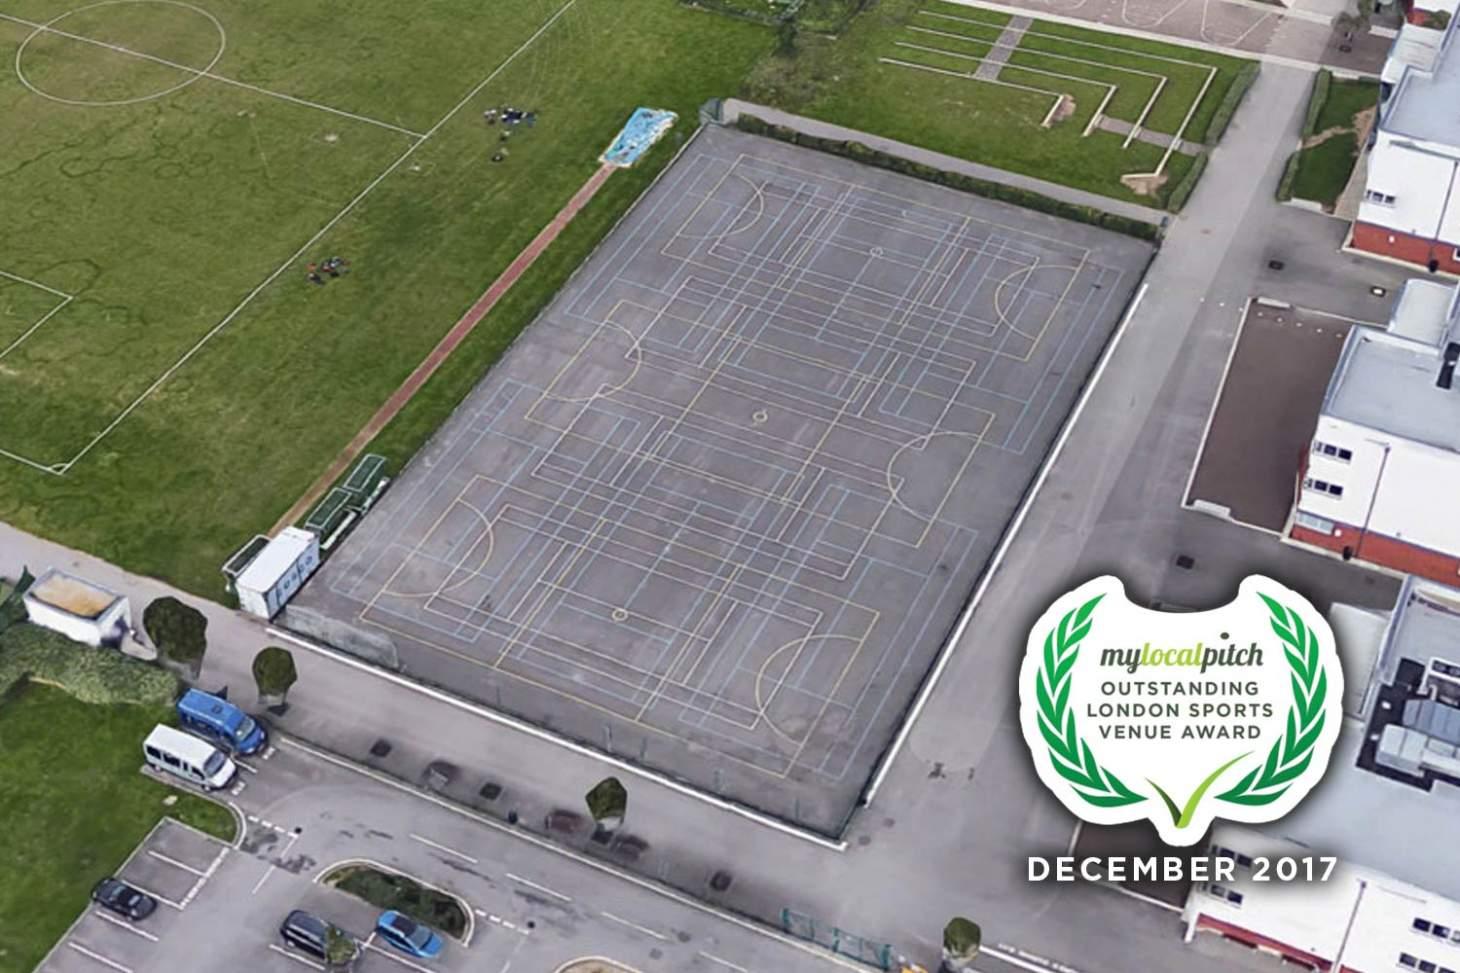 Castle Green Leisure Centre Outdoor   Hard (macadam) netball court